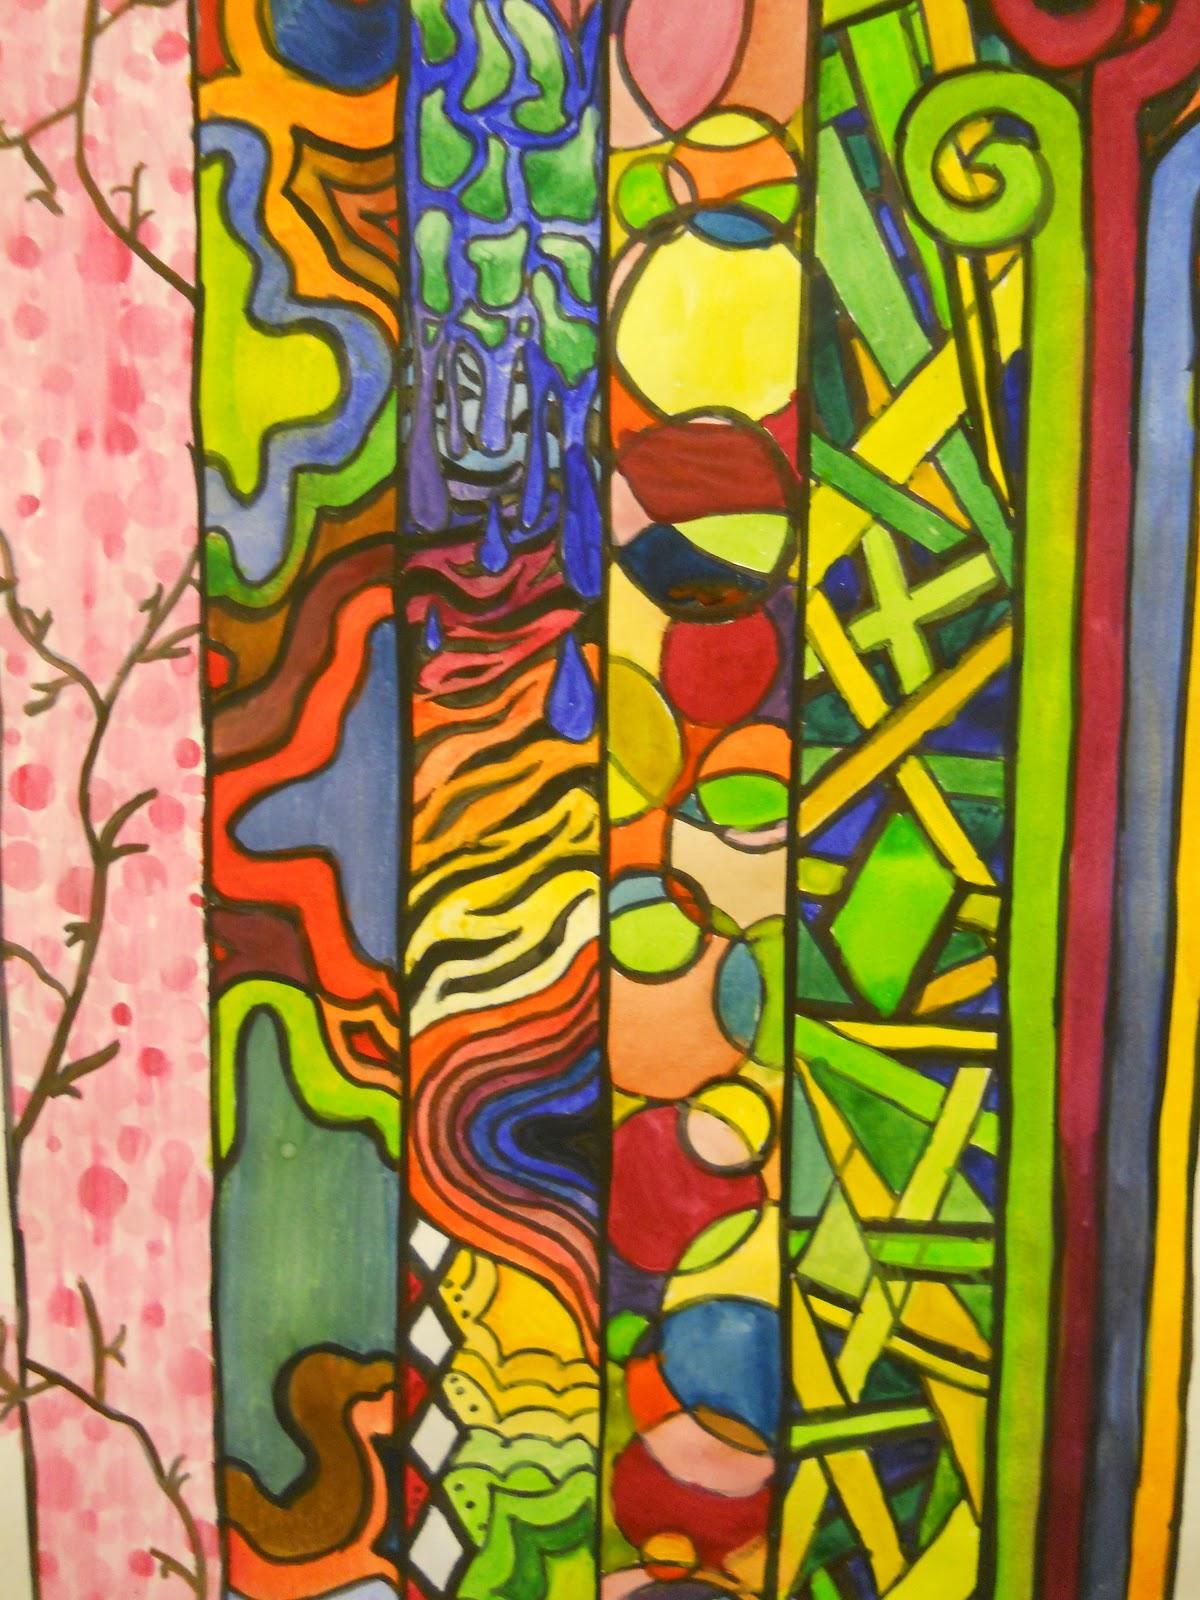 Creative Expressions High School Art